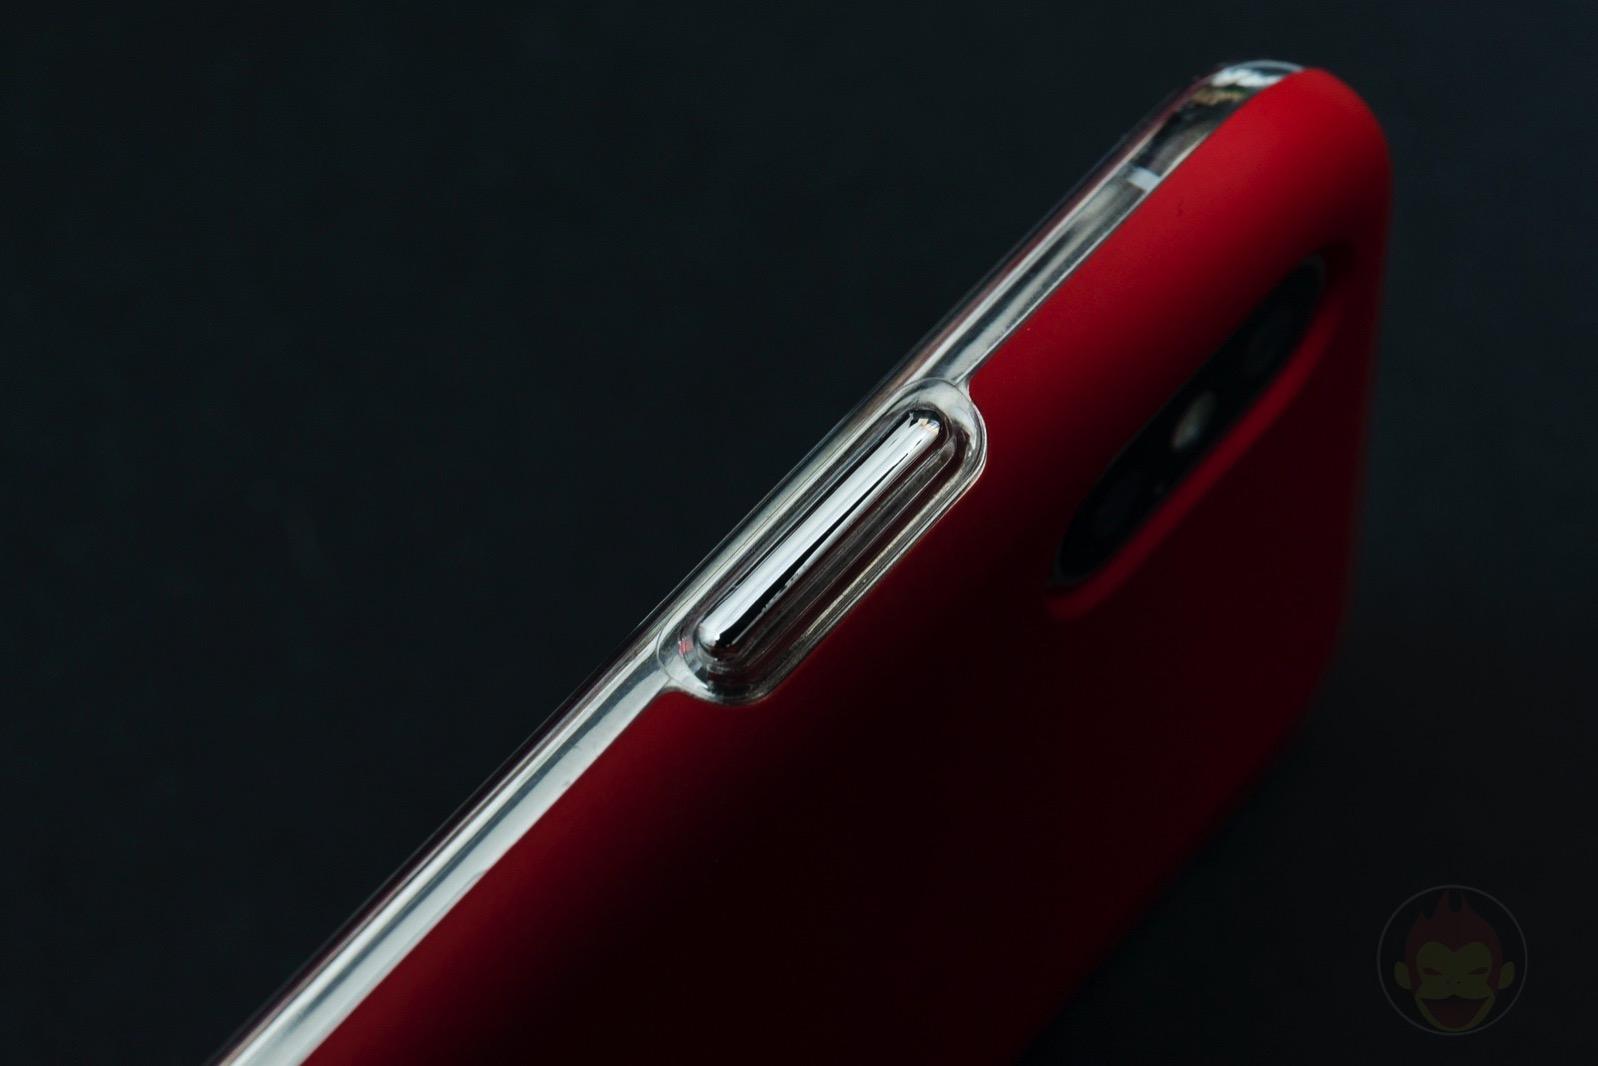 PhoneFoam-Dual-Skin-iPhoneX-Case-10.jpg